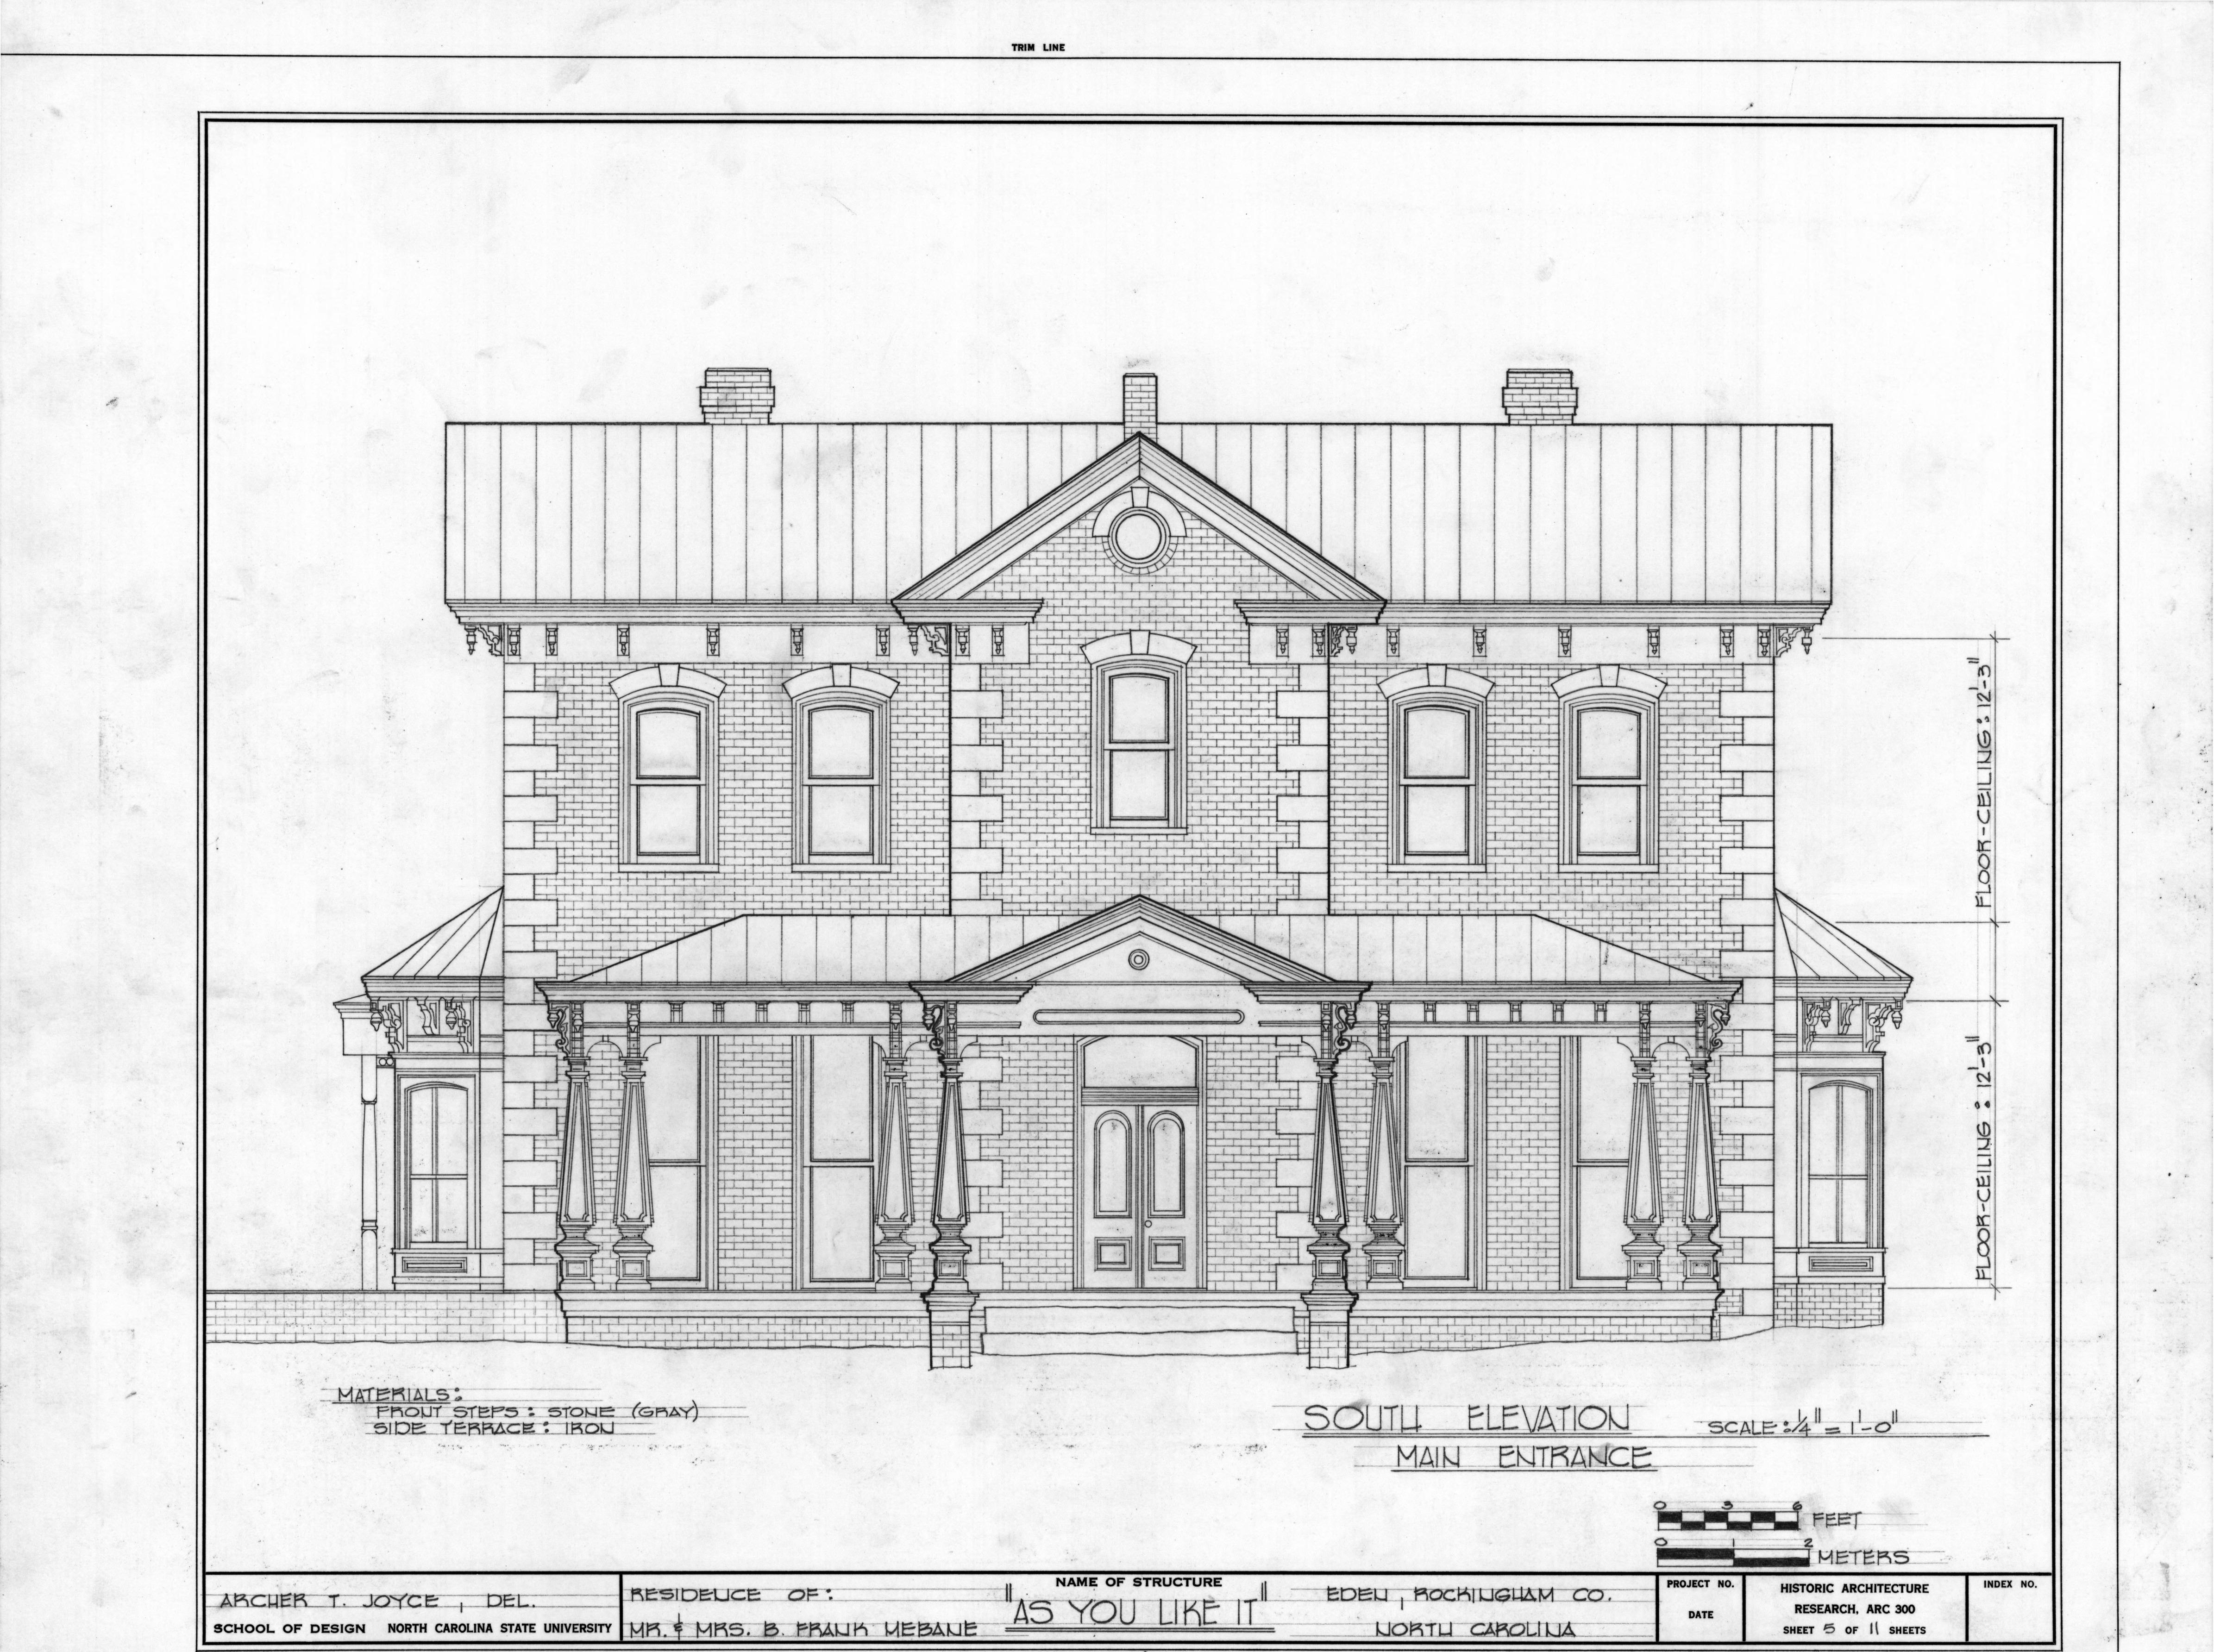 Monticello Second Floor Plan South Elevation Morehead Mebane House Eden North